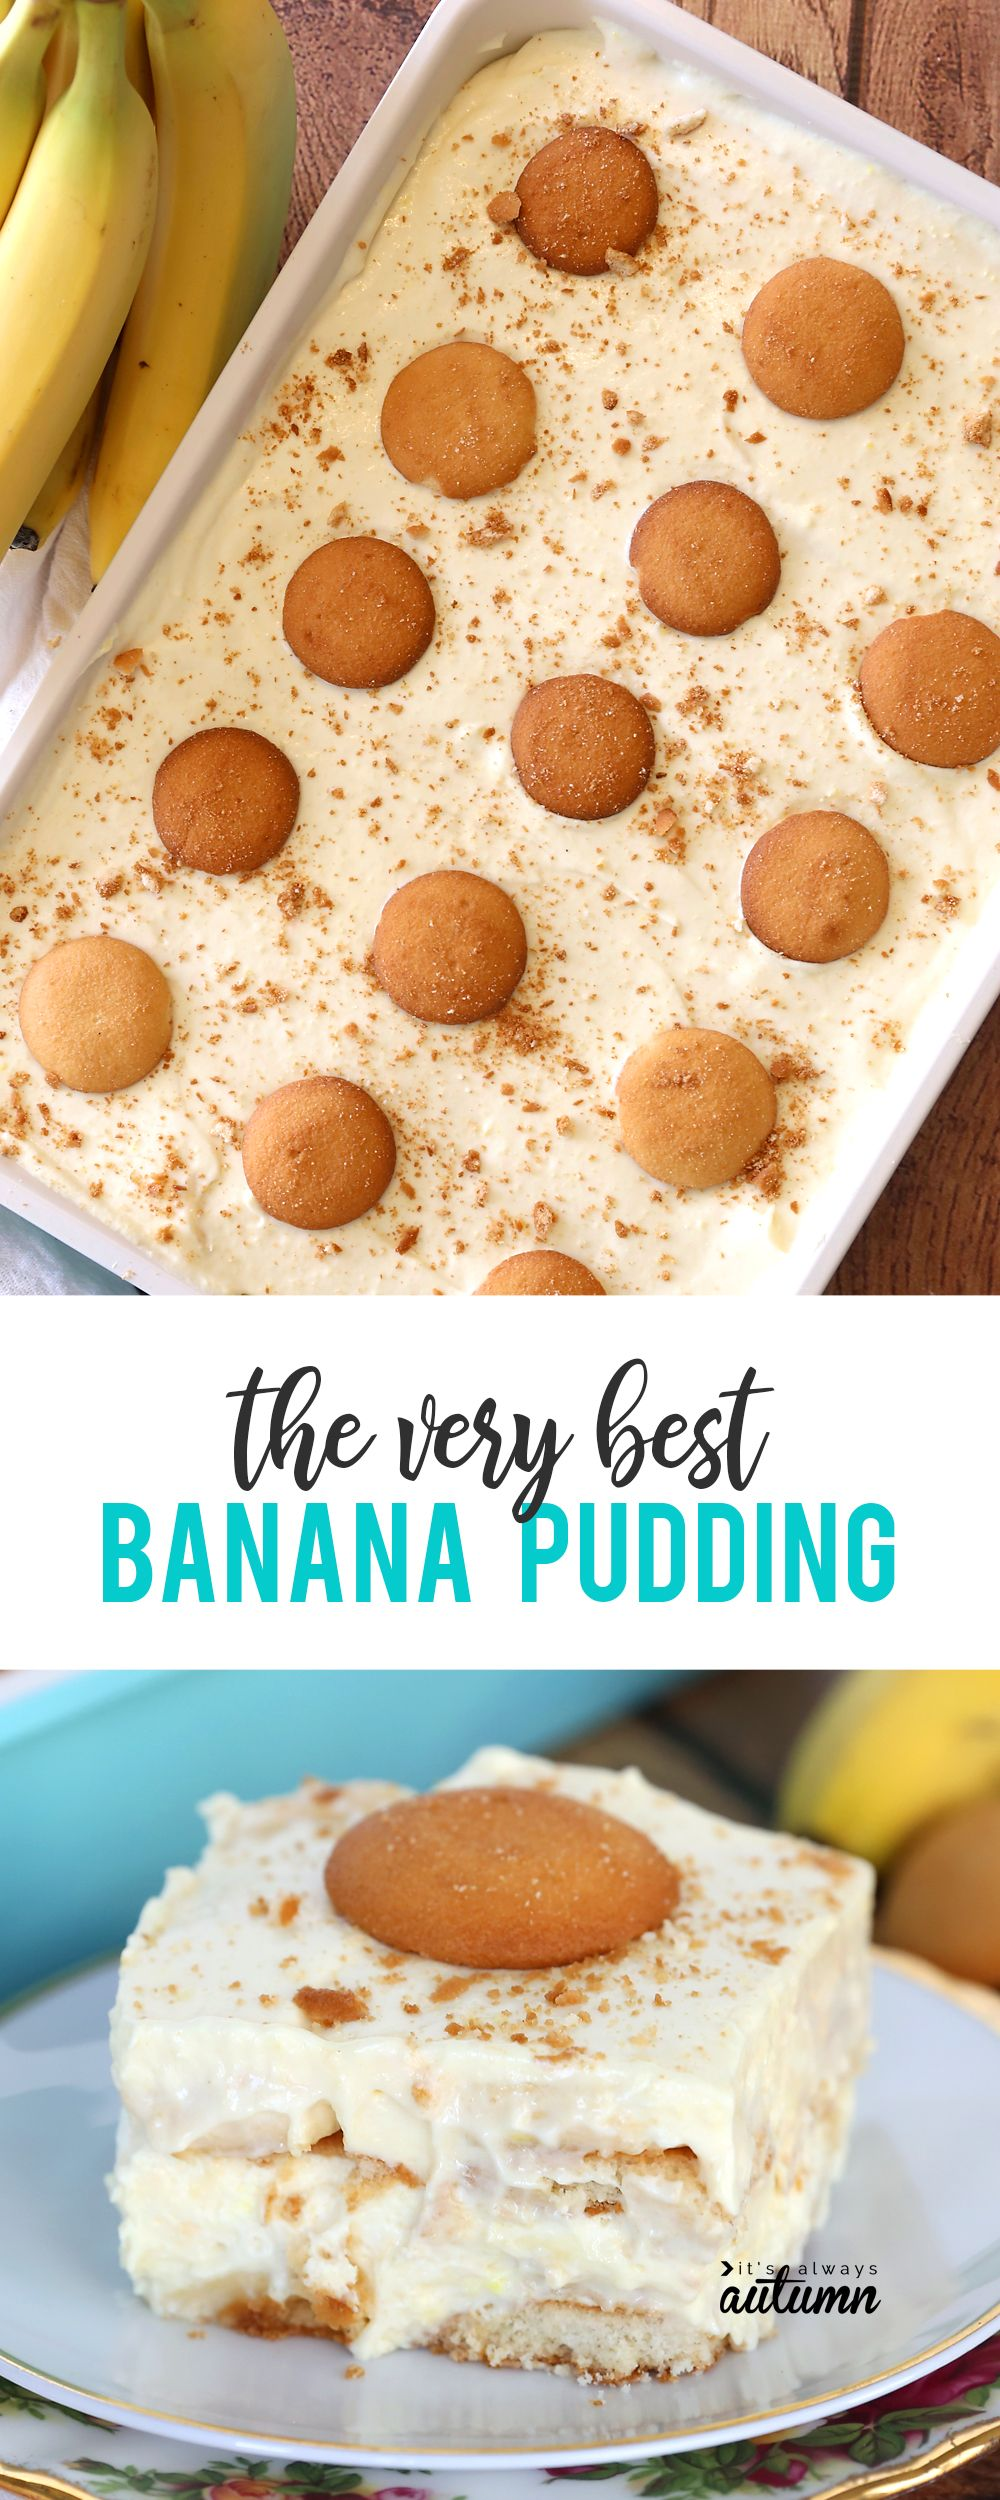 Best Easy Banana Pudding Recipe With Vanilla Wafers How To Make Recipe Easy Banana Pudding Recipe Banana Dessert Recipes Easy Banana Pudding